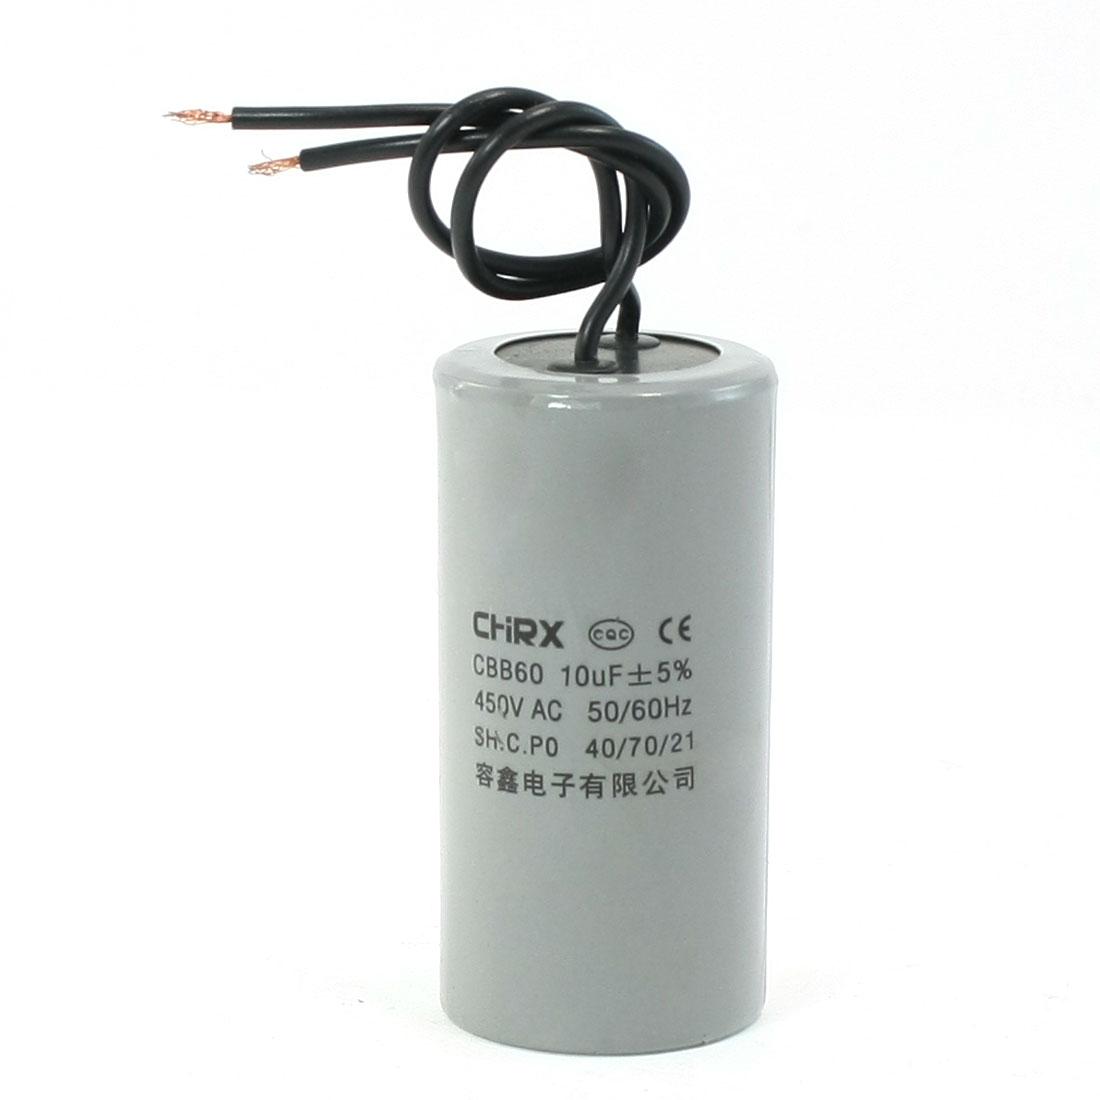 CBB60 AC 450V 10uF Polypropylene Film Motor Running Capacitor Gray